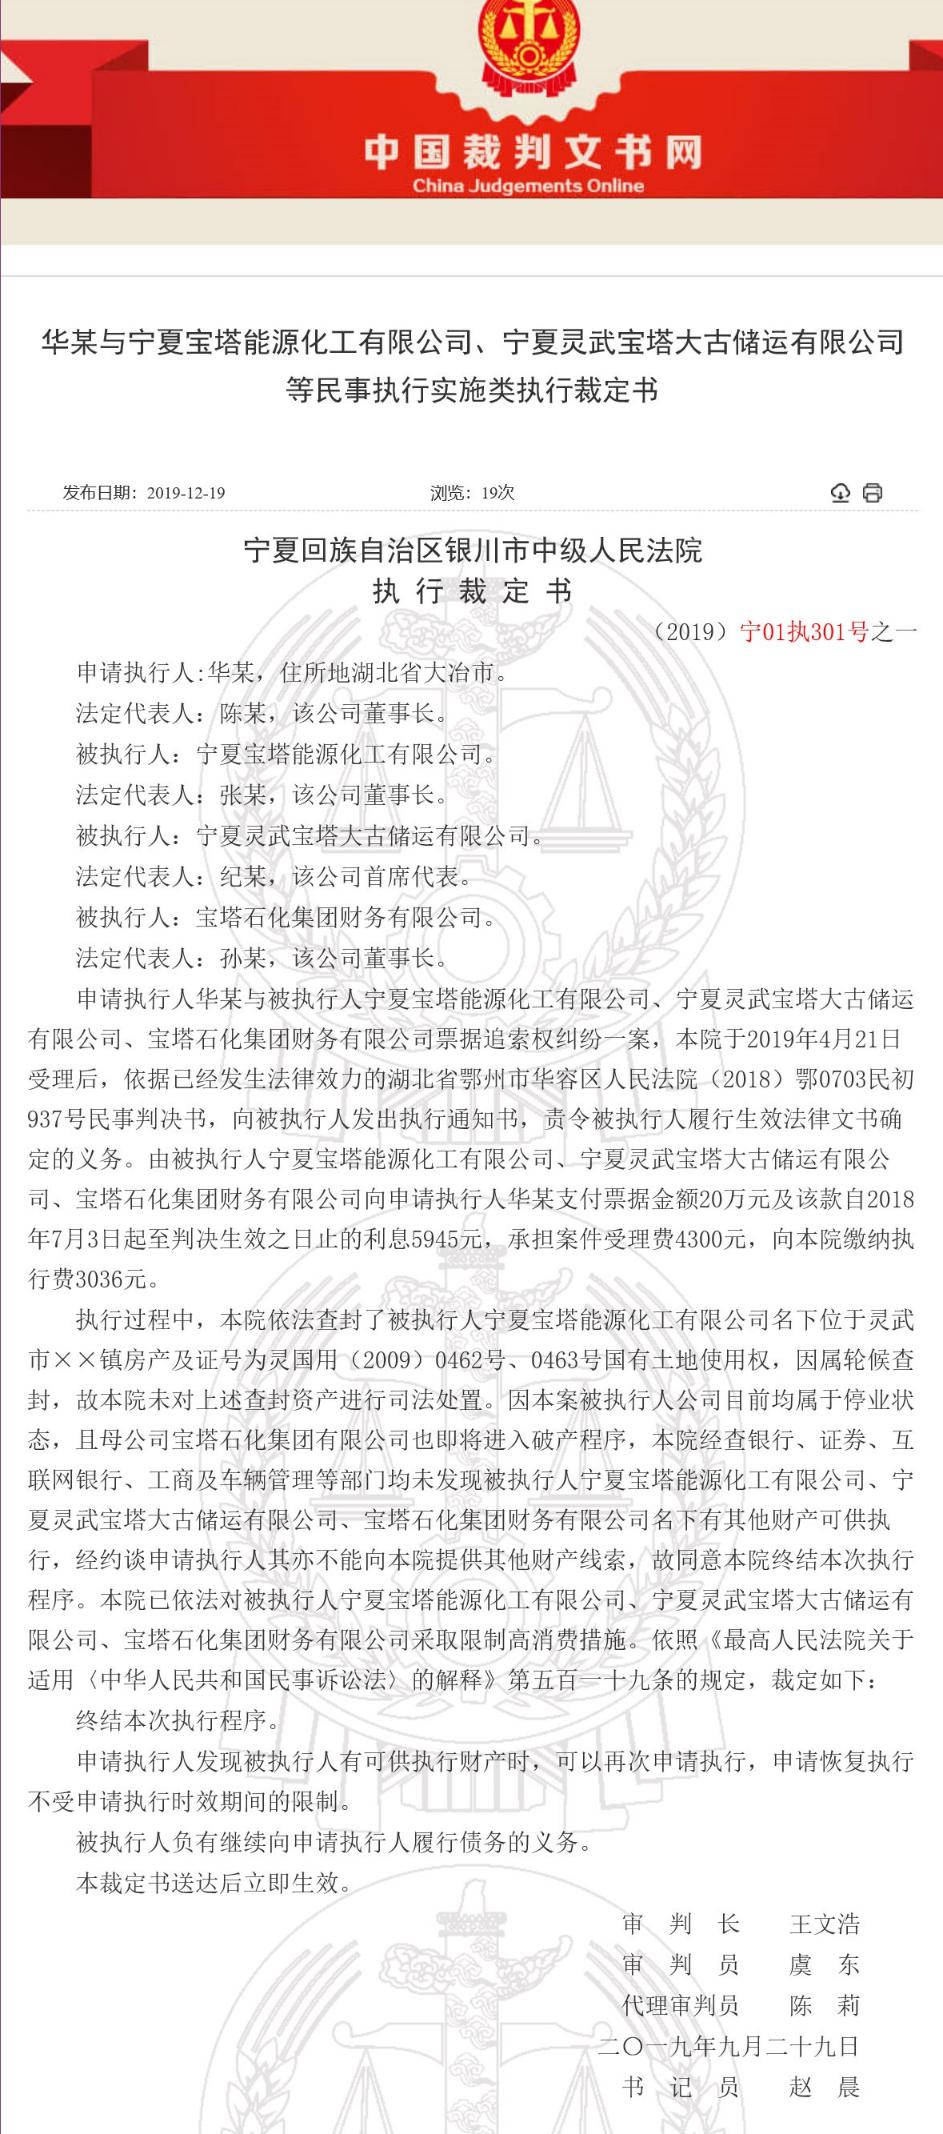 http://www.byrental.cn/zhengwu/177102.html